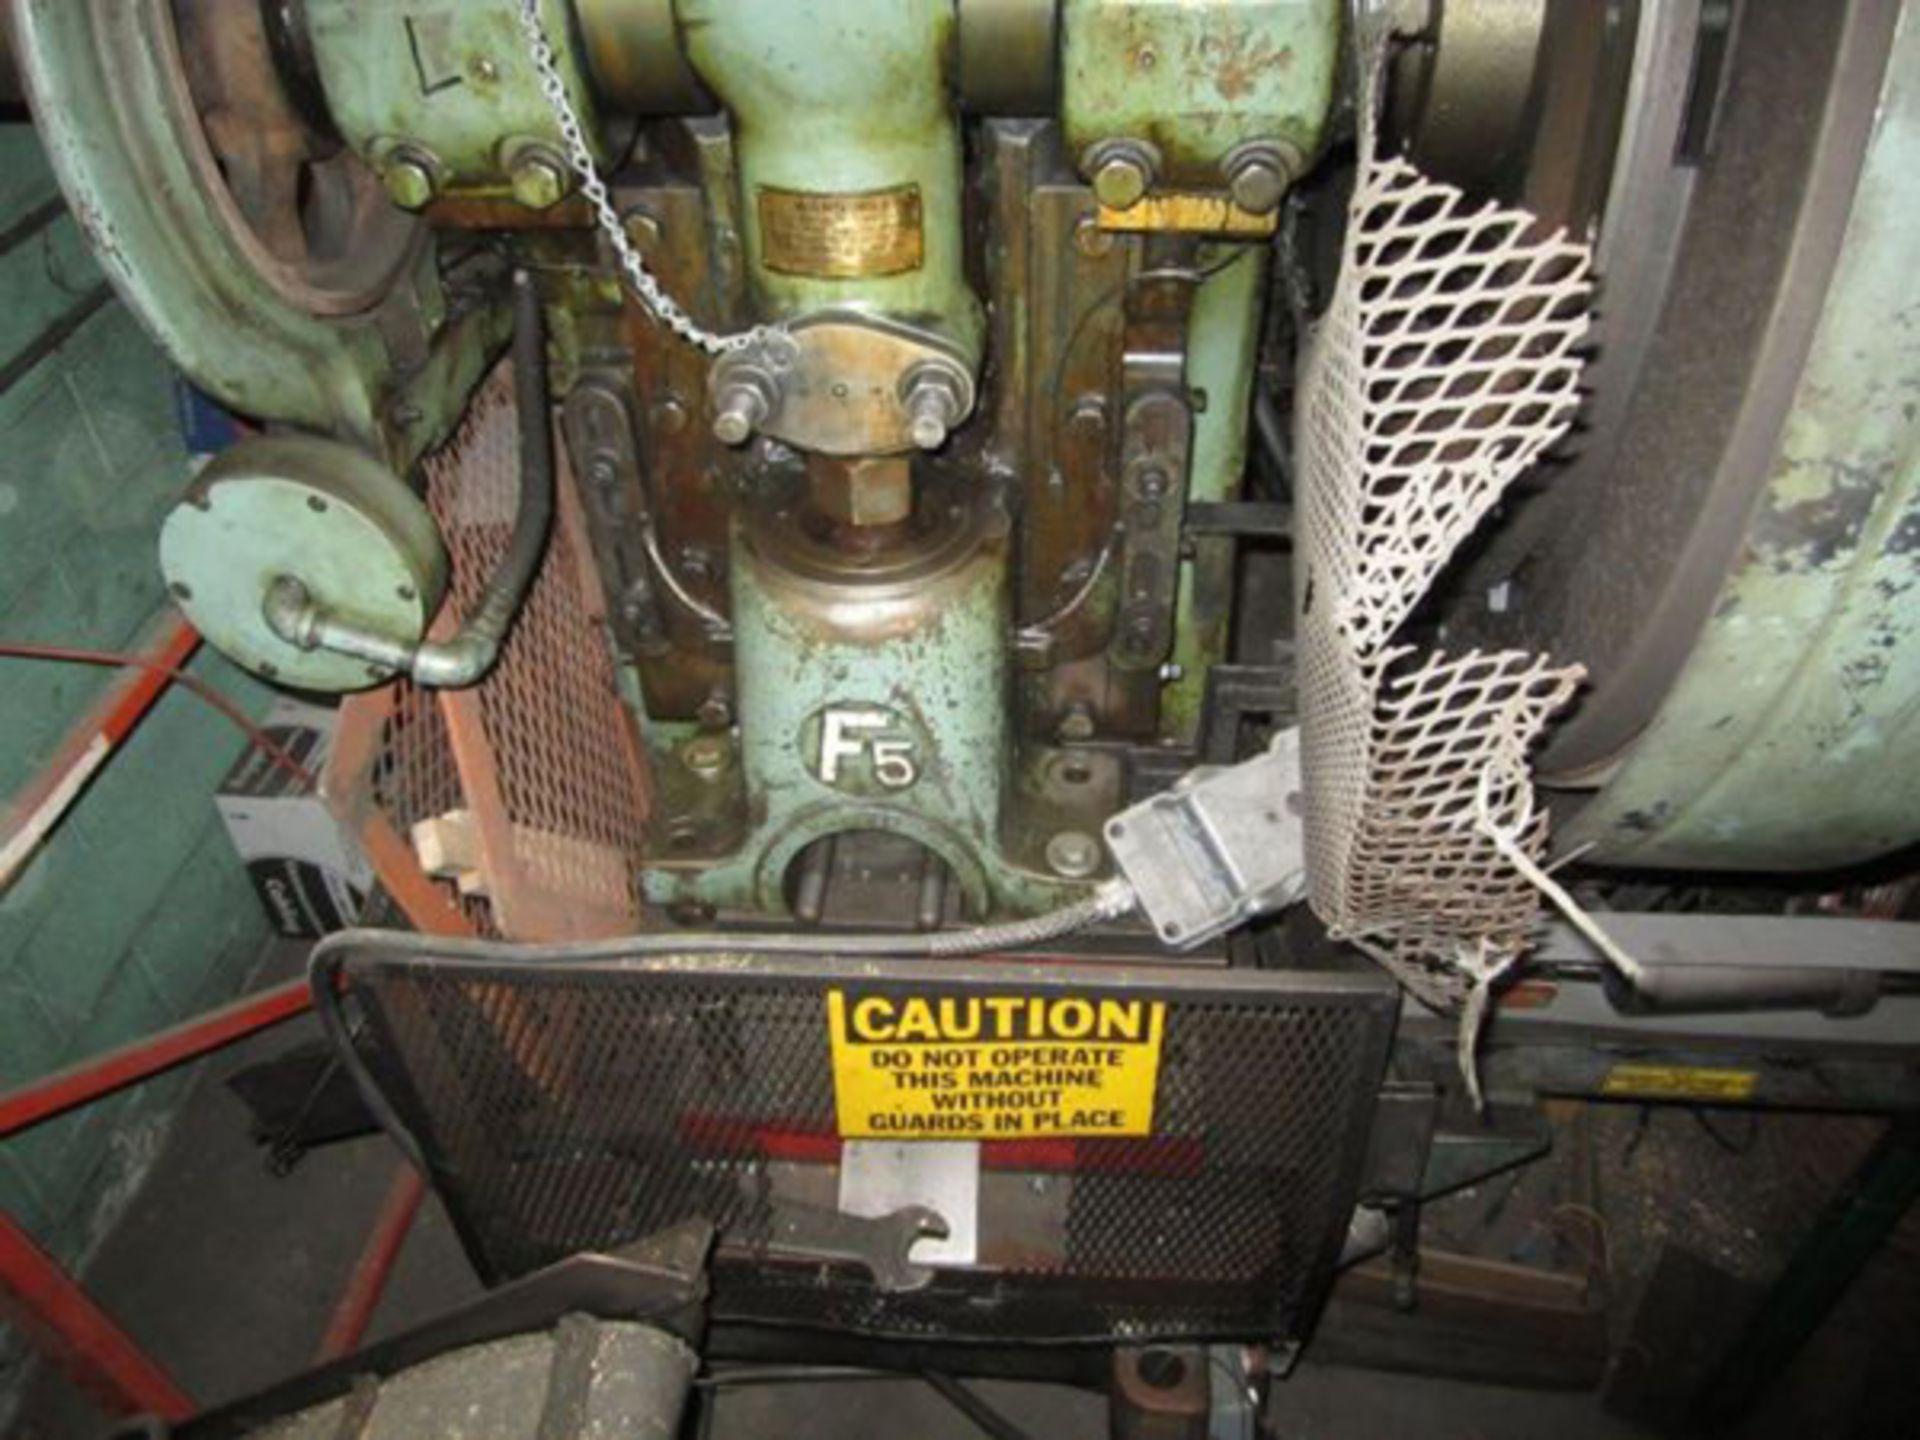 "Federal OBI Punch Press   60-Ton x 29 1/2"" x 18 1/2"", Mdl: F-5, S/N: 125400 - 6397P - Image 4 of 6"